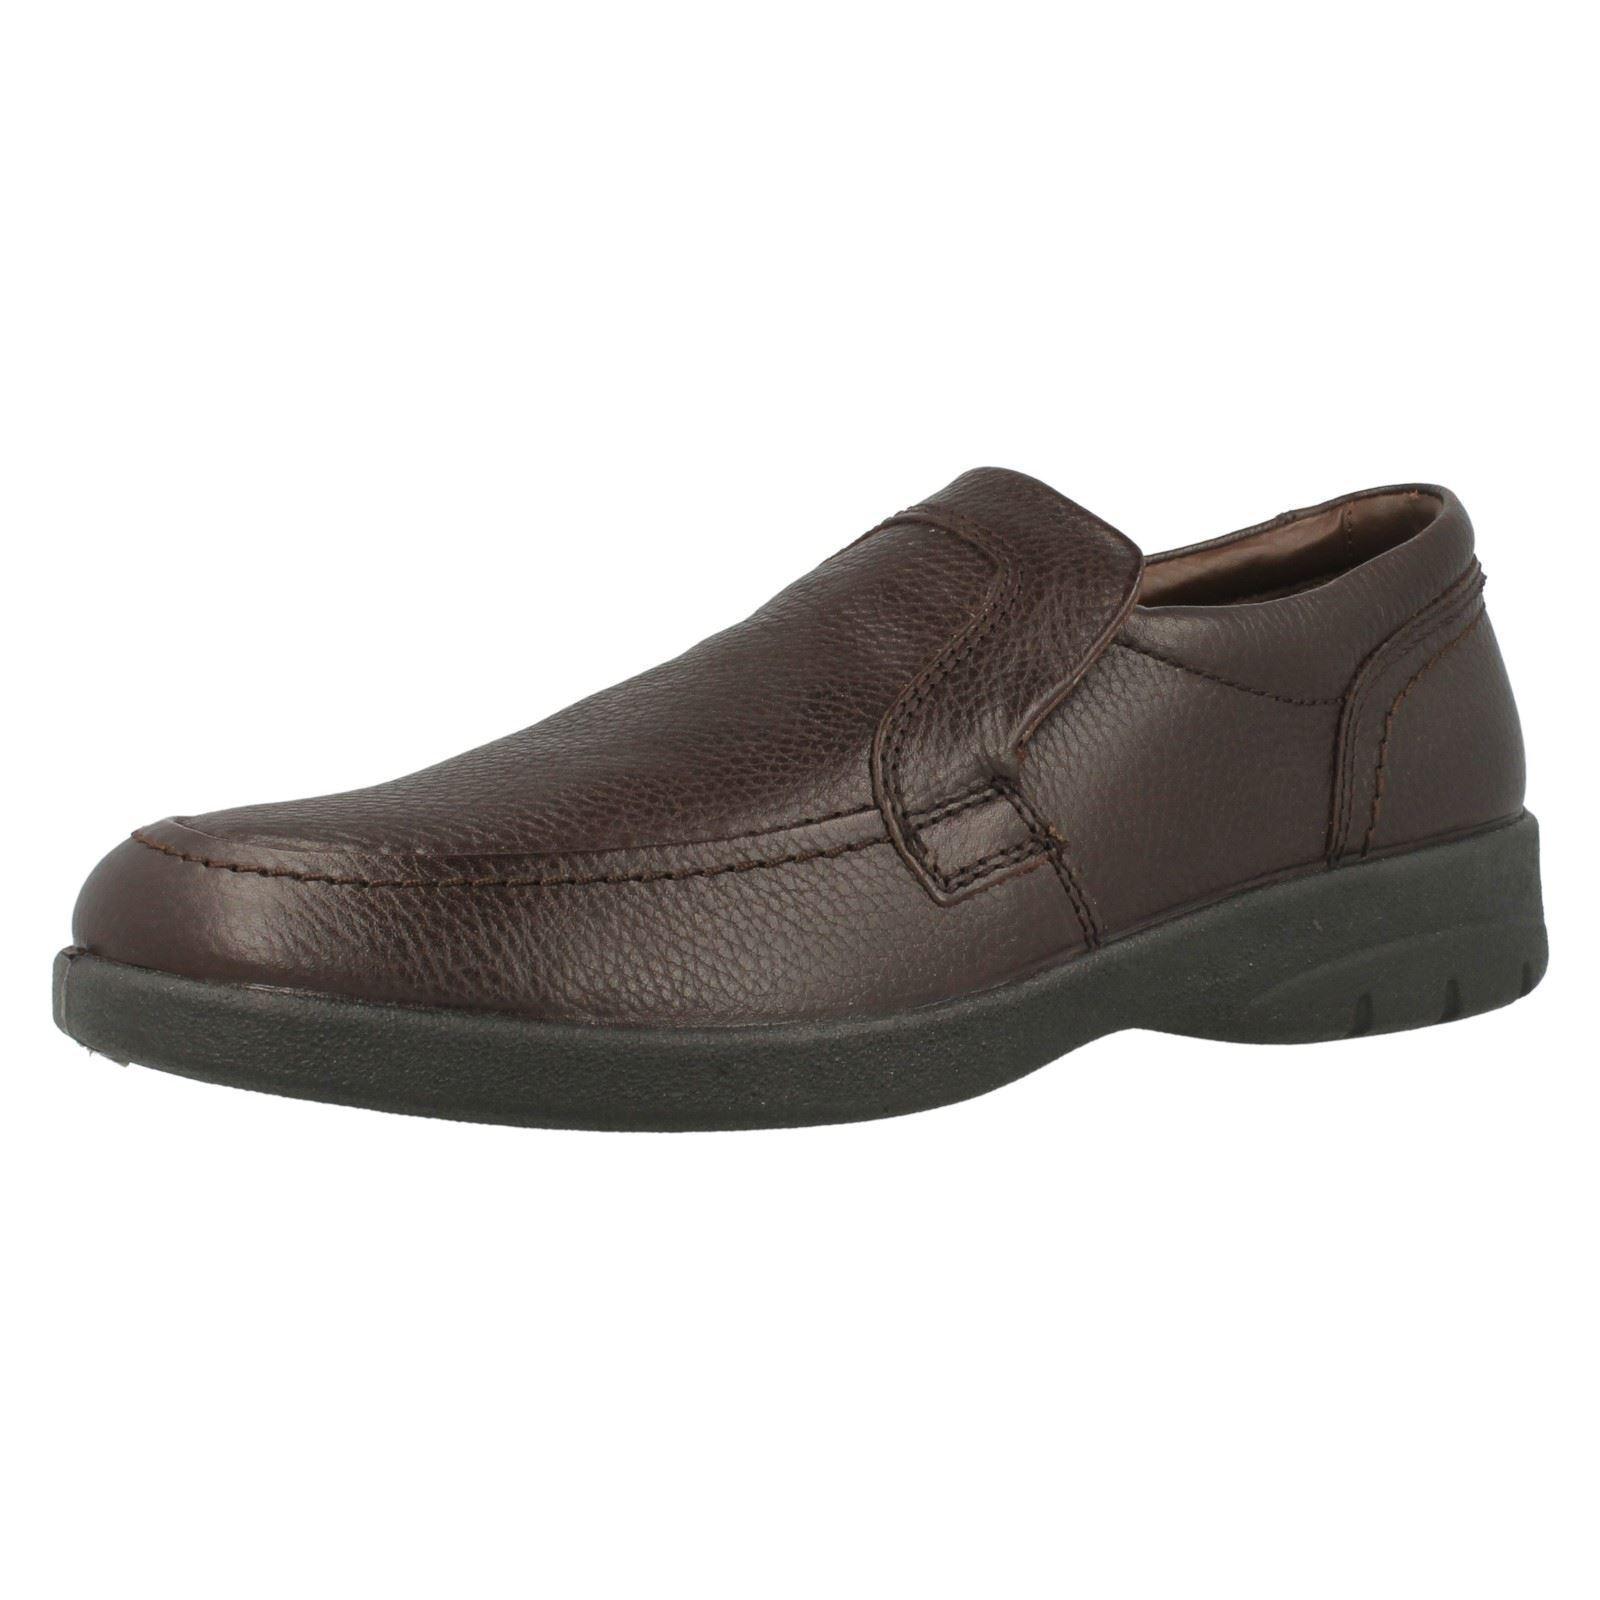 Herren braun Slipper Leder Padders formelle Wohlfühl Fuß Doppel Passform Schuhe